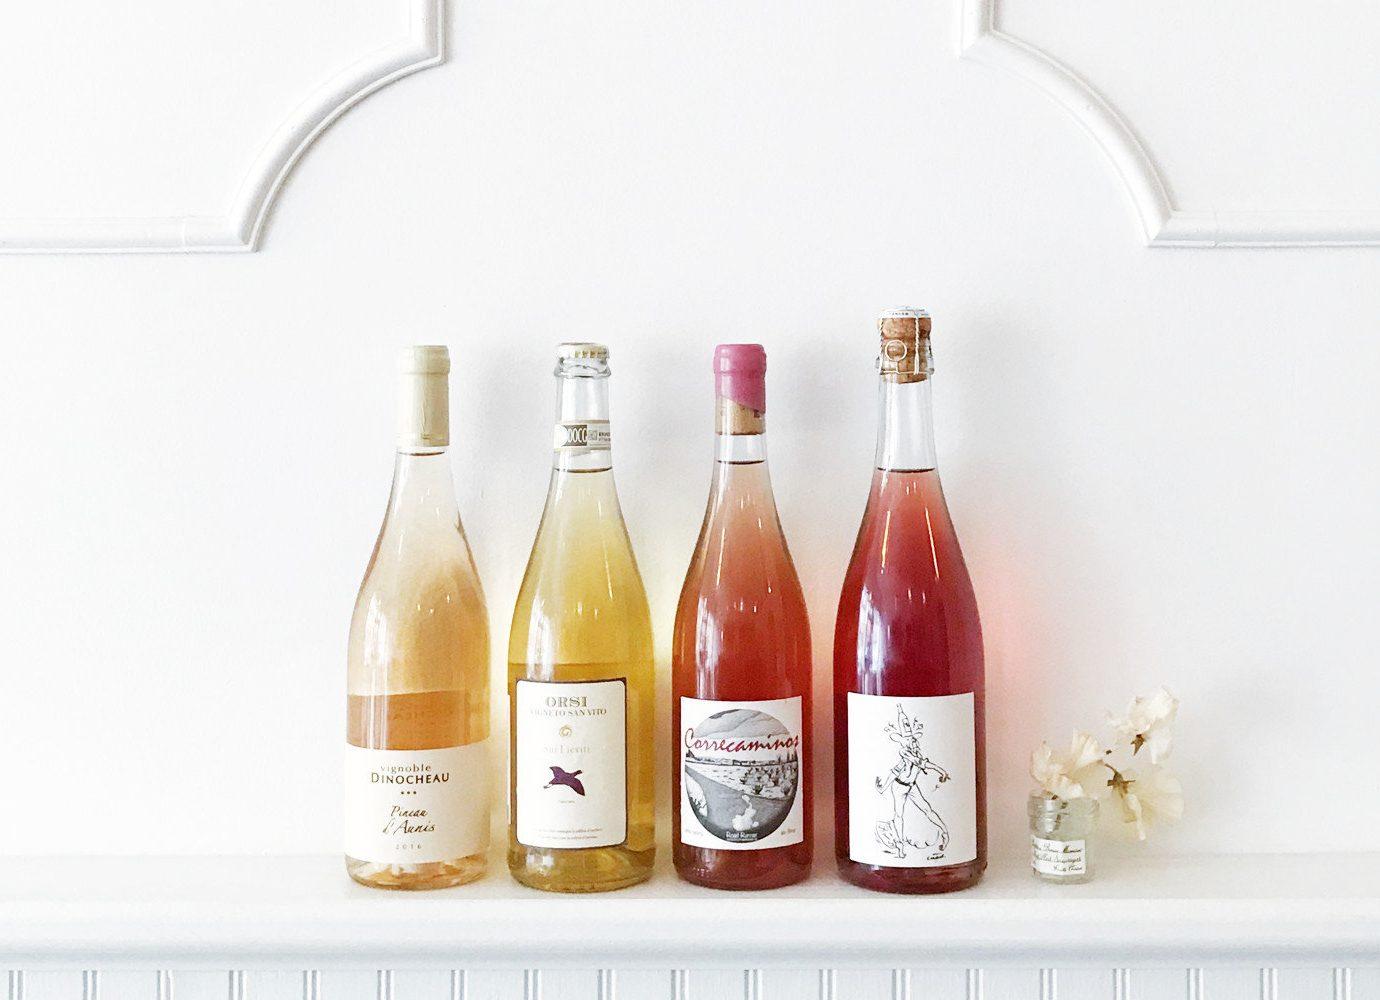 Food + Drink Romantic Getaways Weekend Getaways liqueur Drink bottle wine bottle glass bottle distilled beverage wine champagne product juice